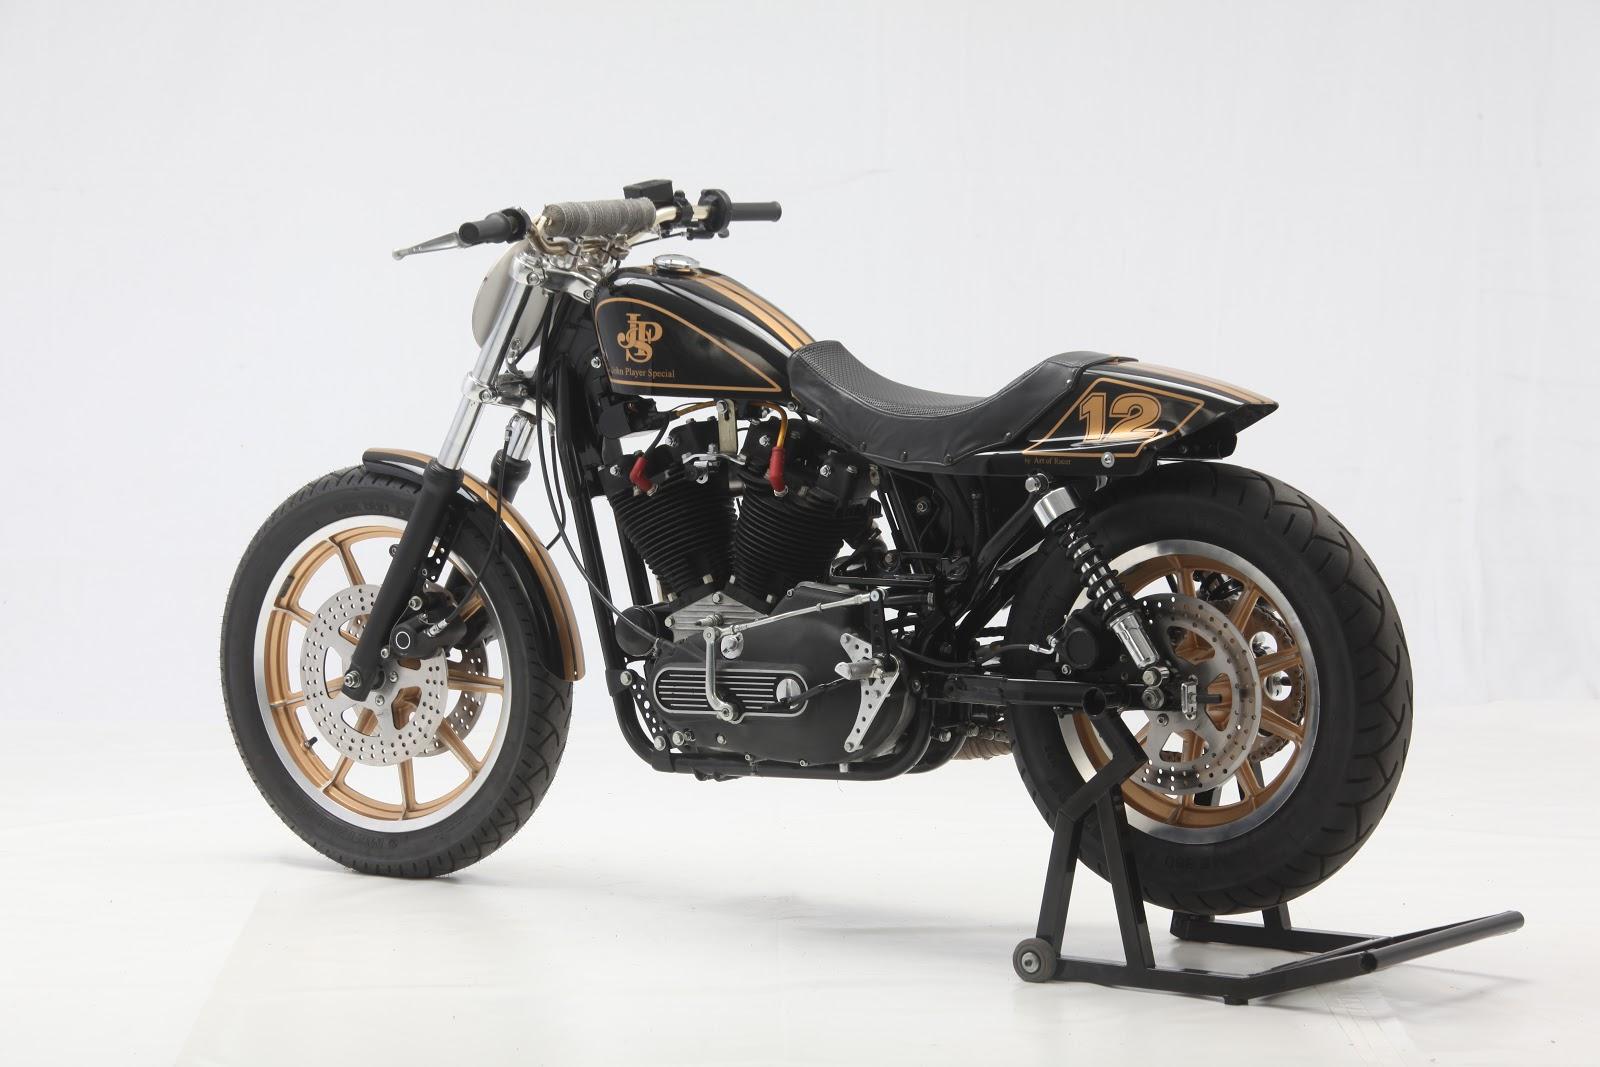 Harley+JPS+by+Art+of+Racer+04 Yamaha Mio Mx Wiring Diagram on yamaha sniper mx, yamaha filano, yamaha motorcycles, yamaha nouvo mx, yamaha yamaha, yamaha vega force, yamaha jupiter mx 2014,